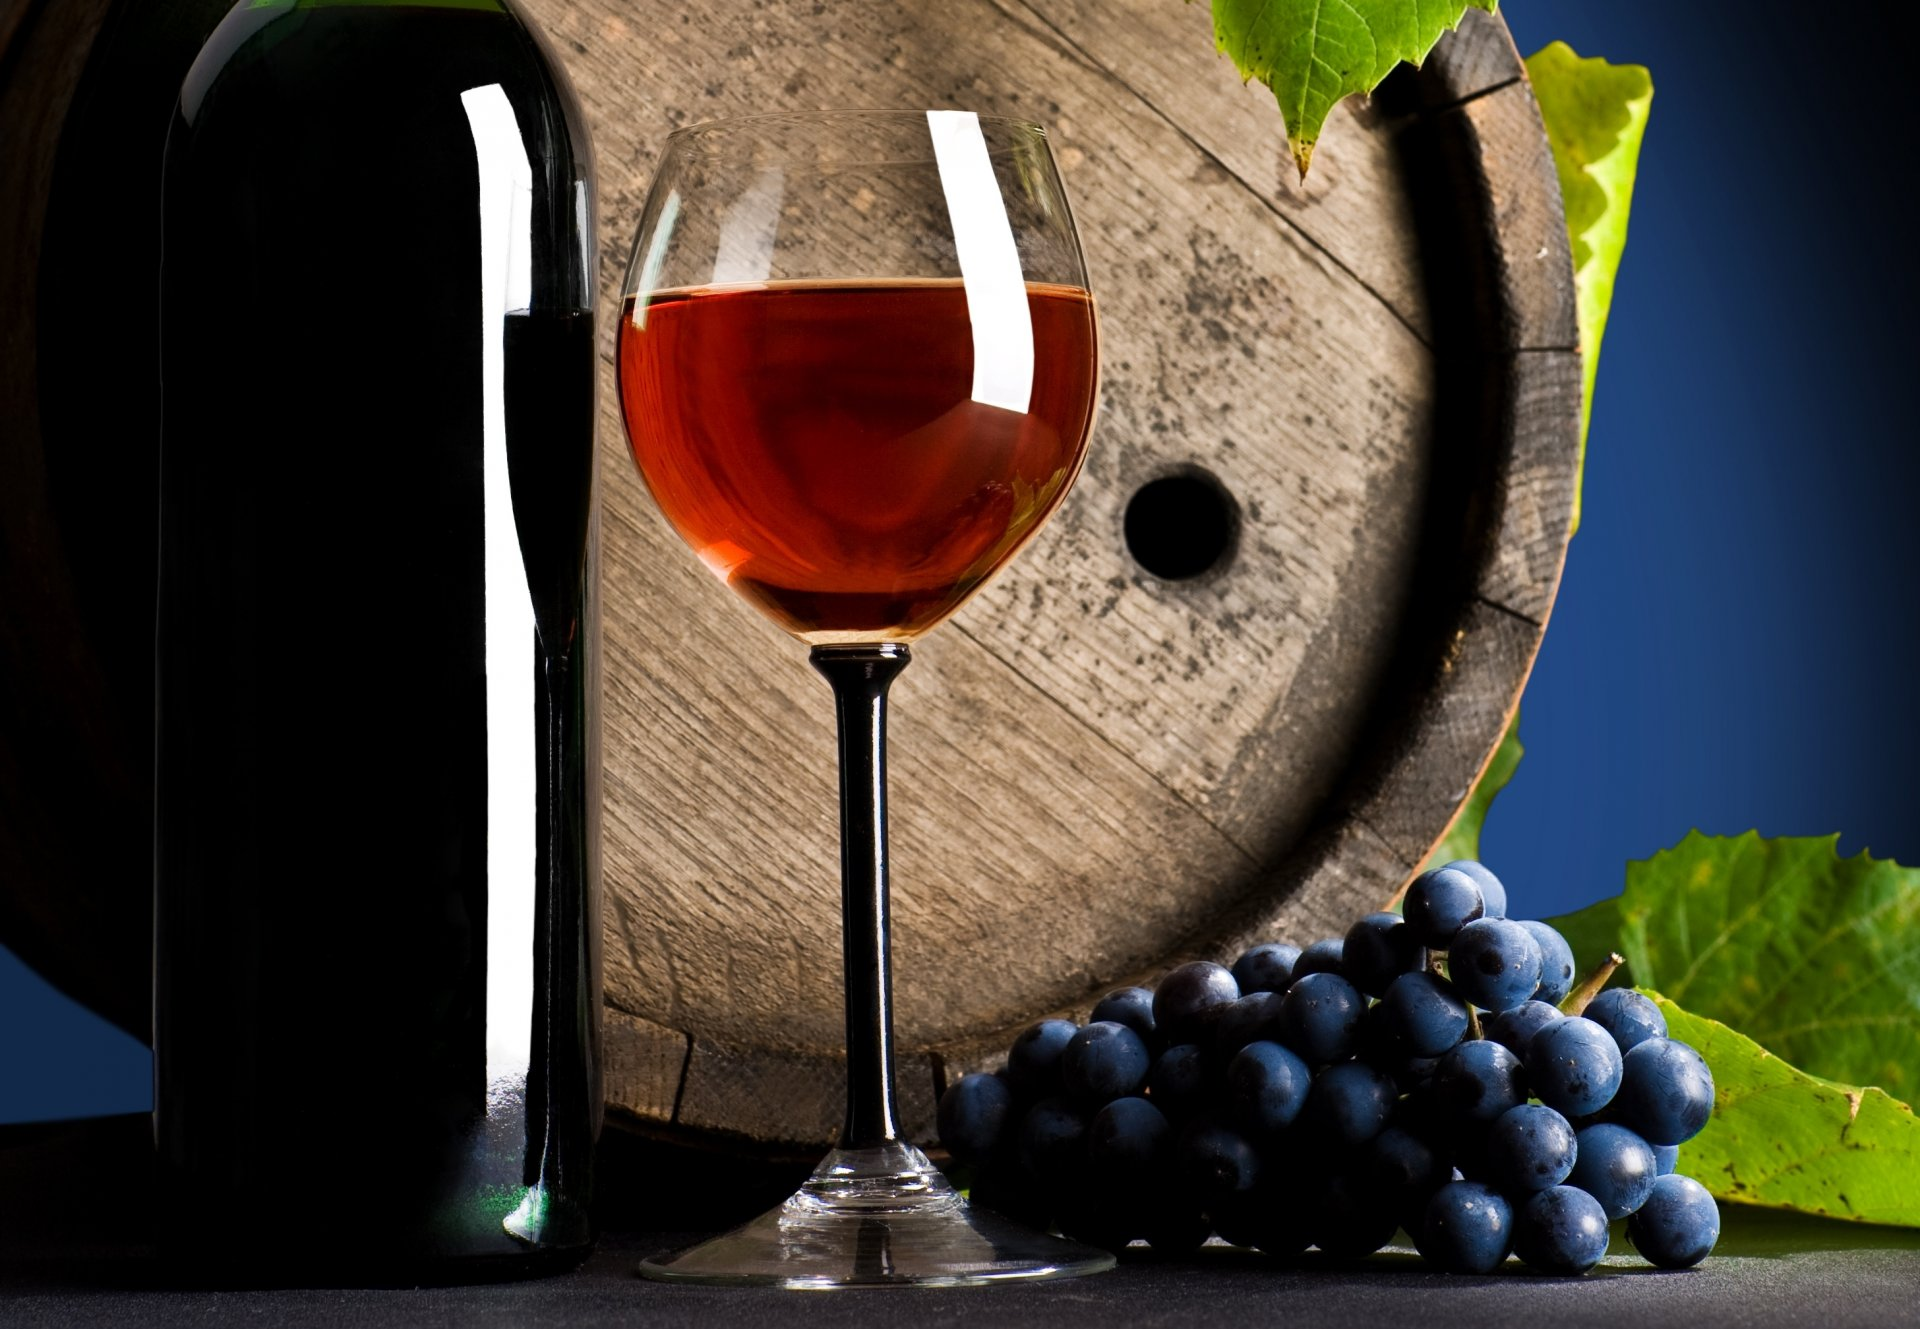 Бутылка вина картинки красивые